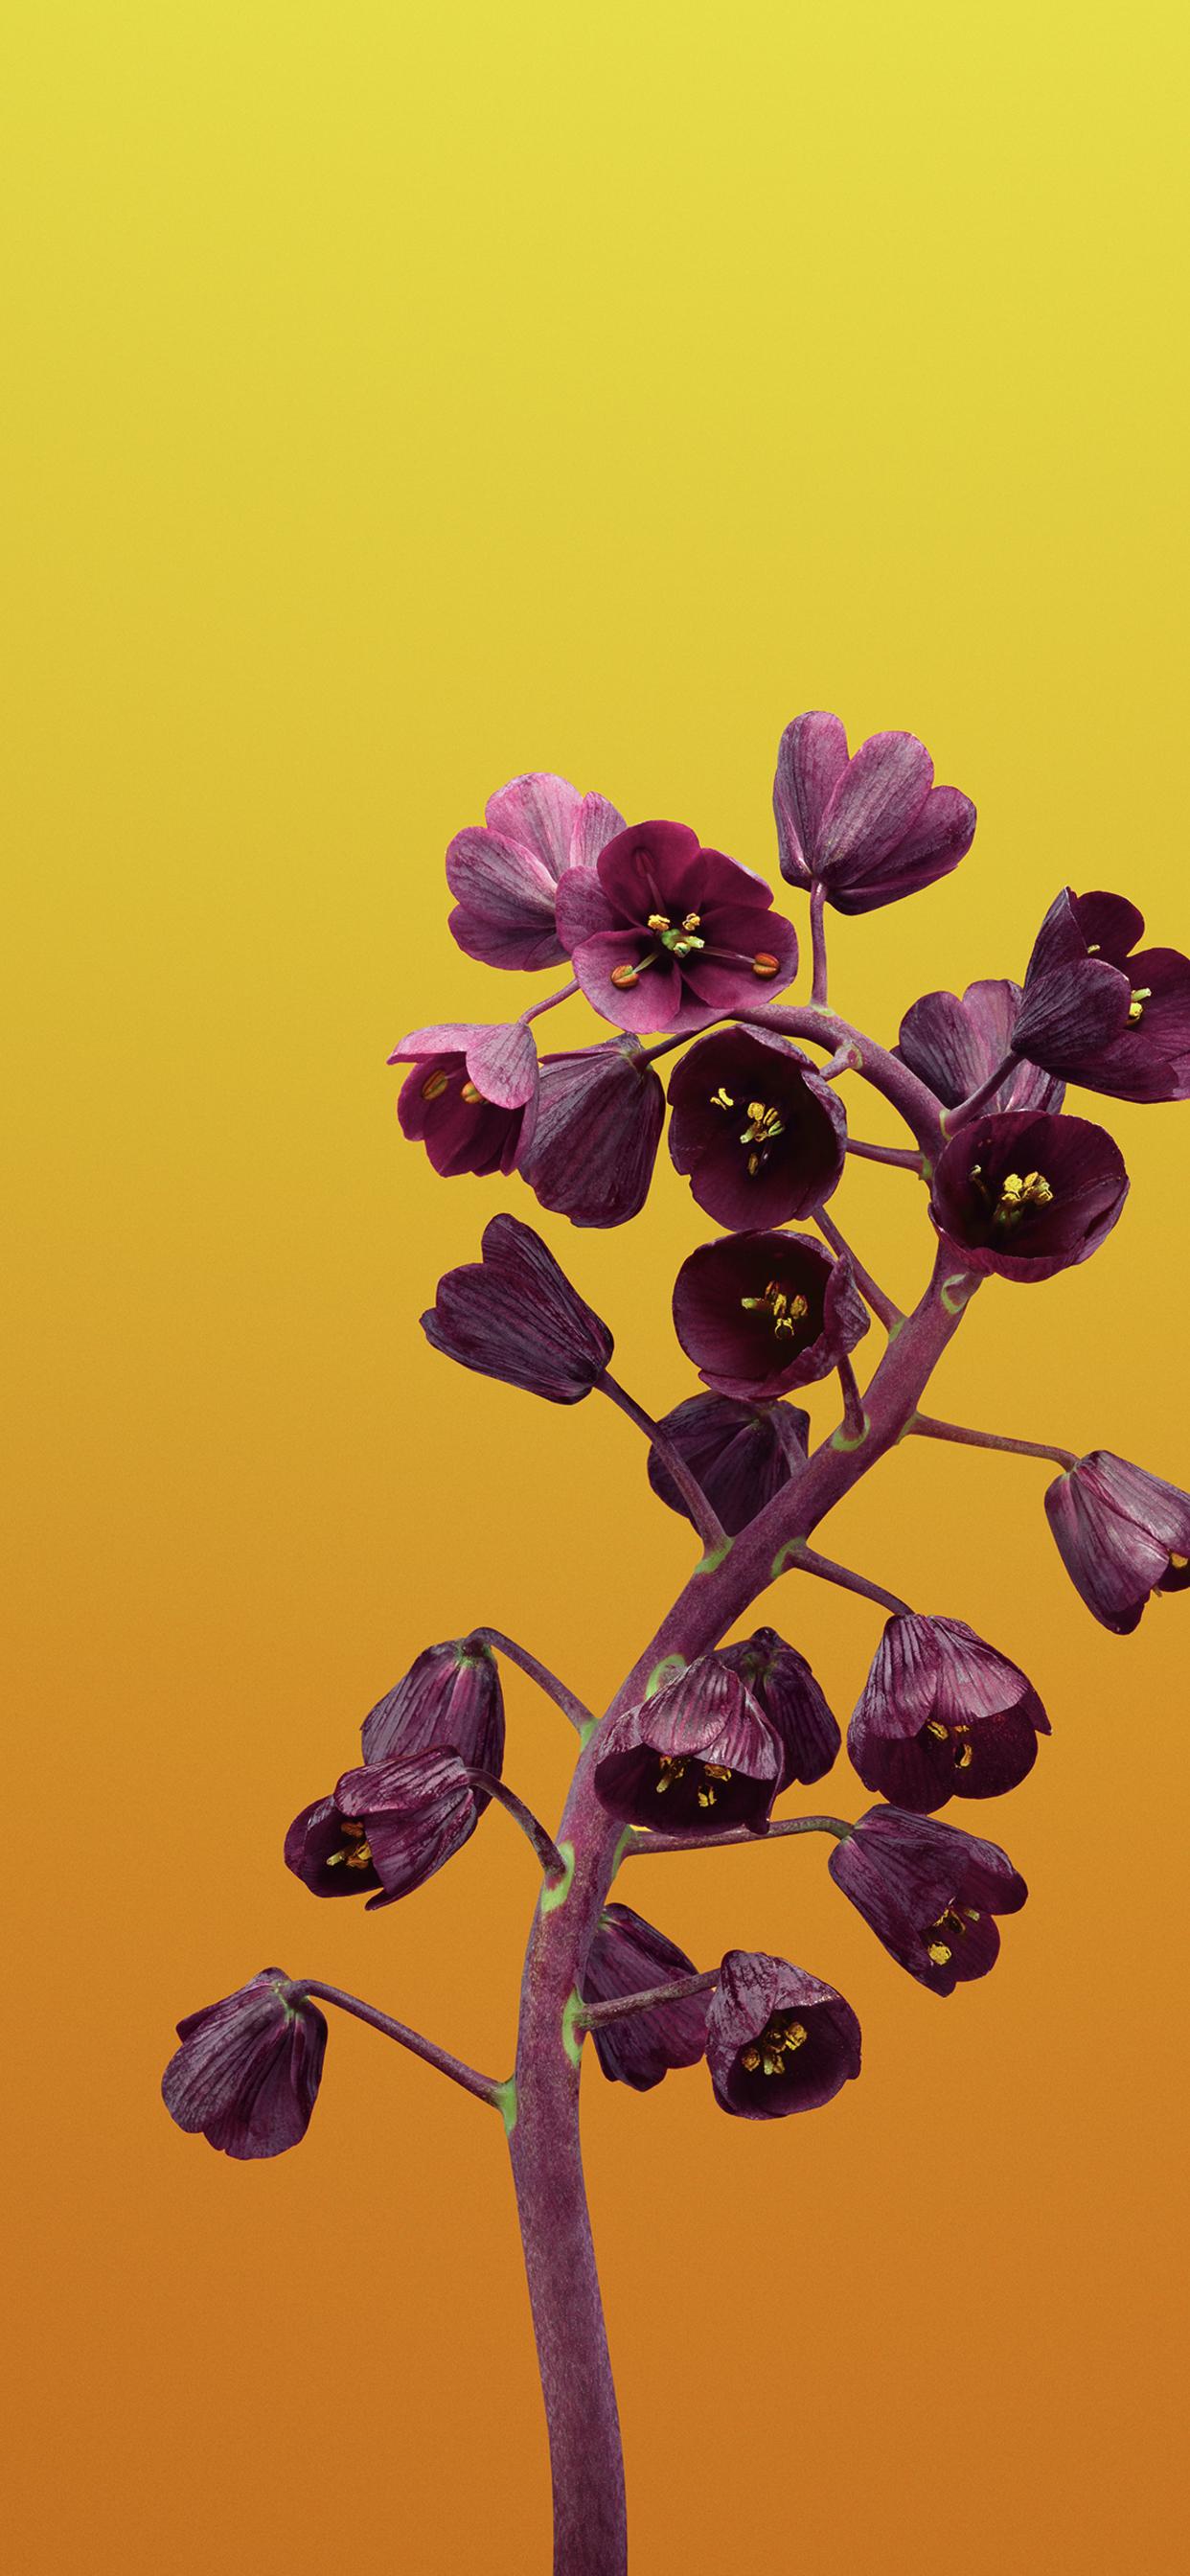 120 1202145 ios 11 flower fritillaria yellow 4k wallpaper iphone